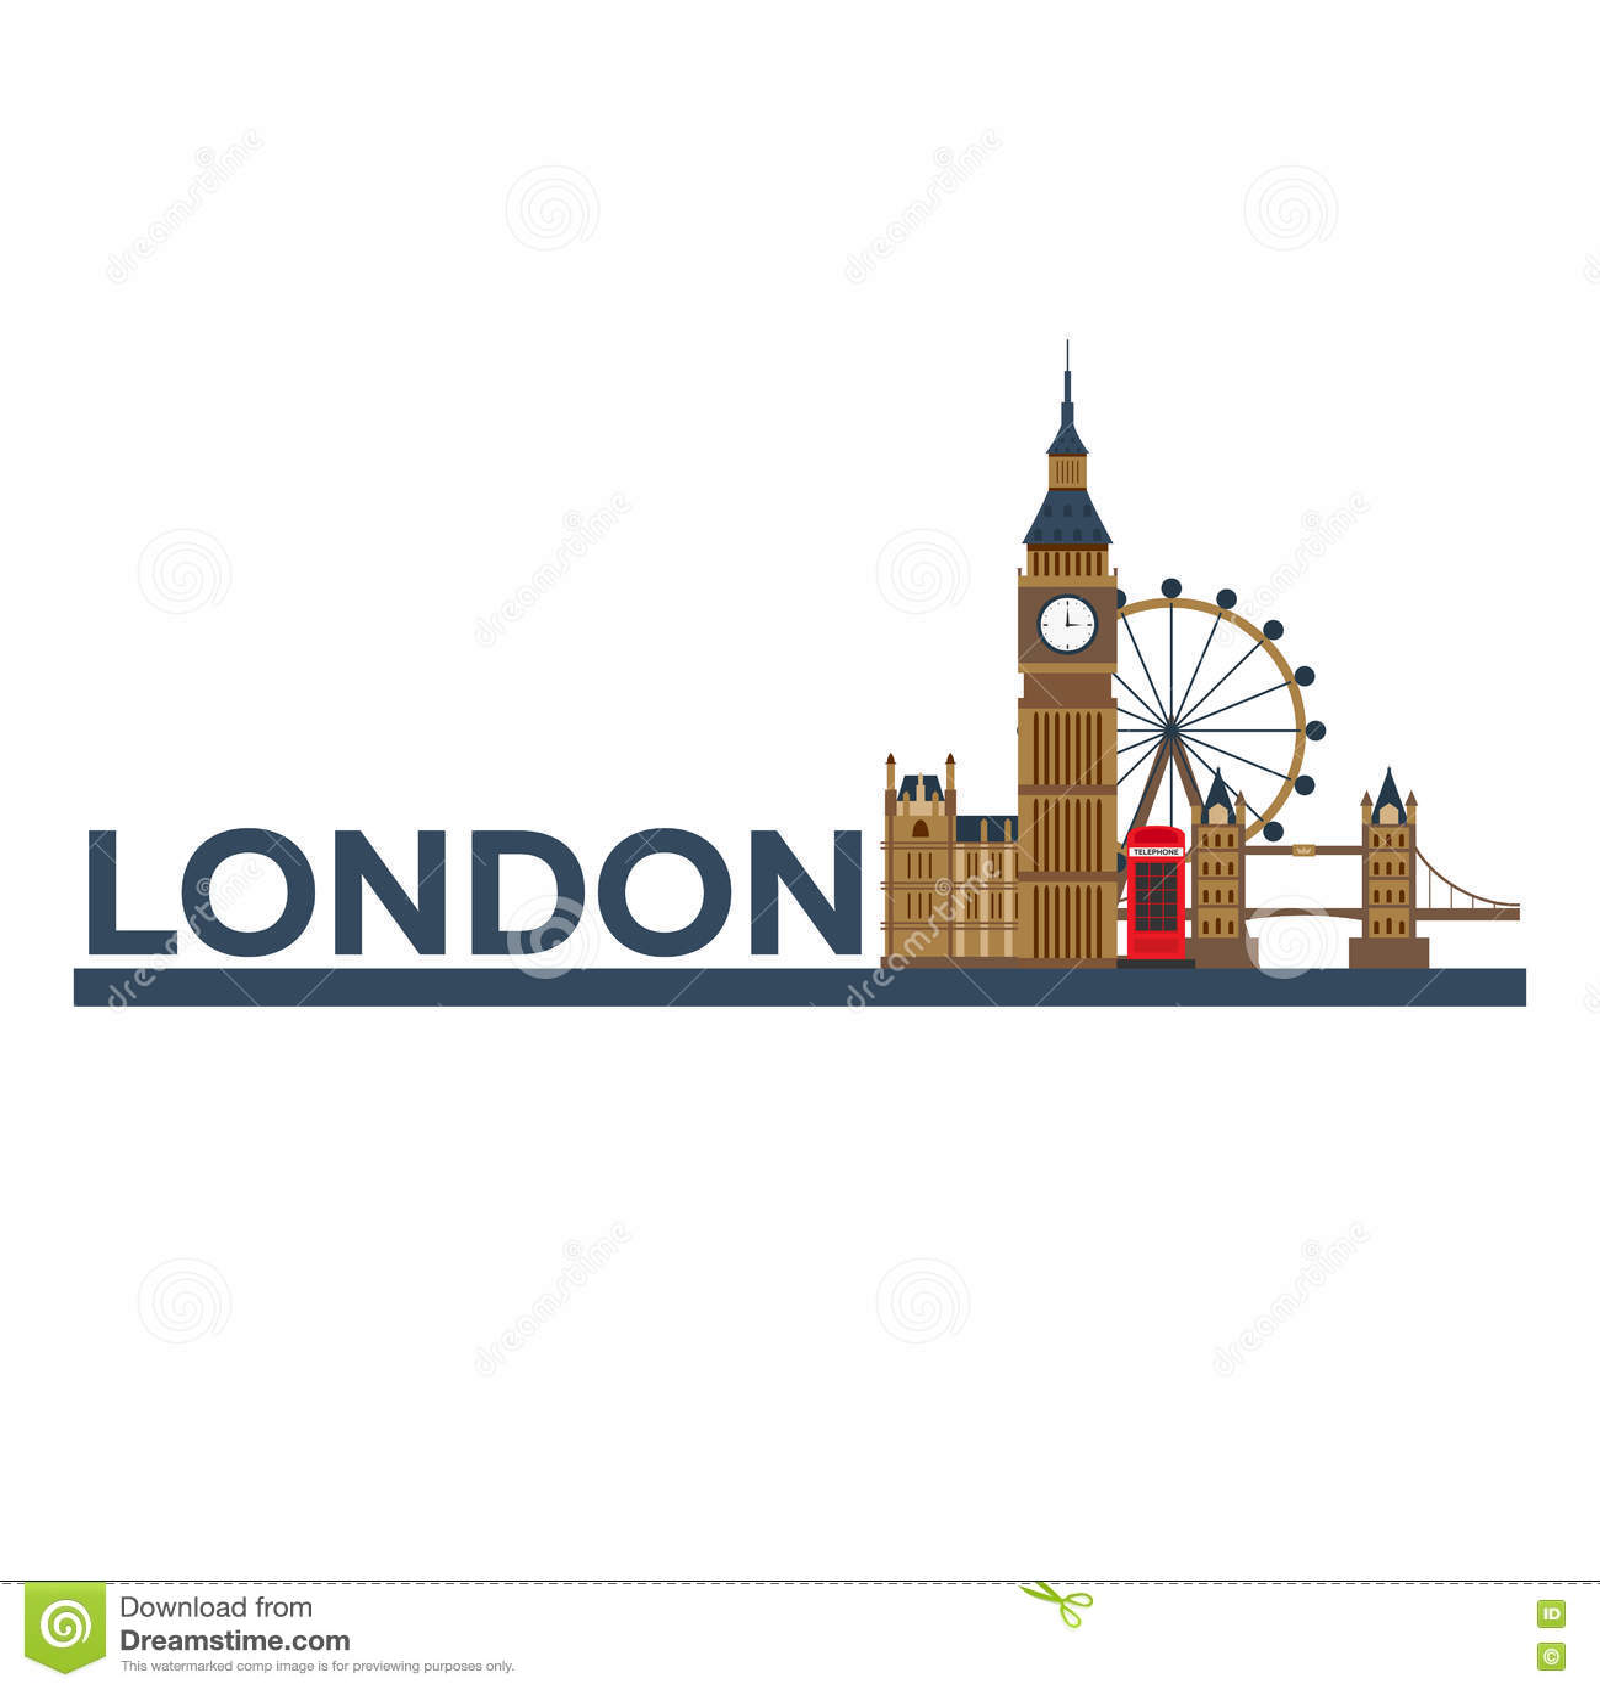 London Engelsk arkitektur Turism Resande illustrationLondon stad Modern plan design stort förbud england designillustrationlondon